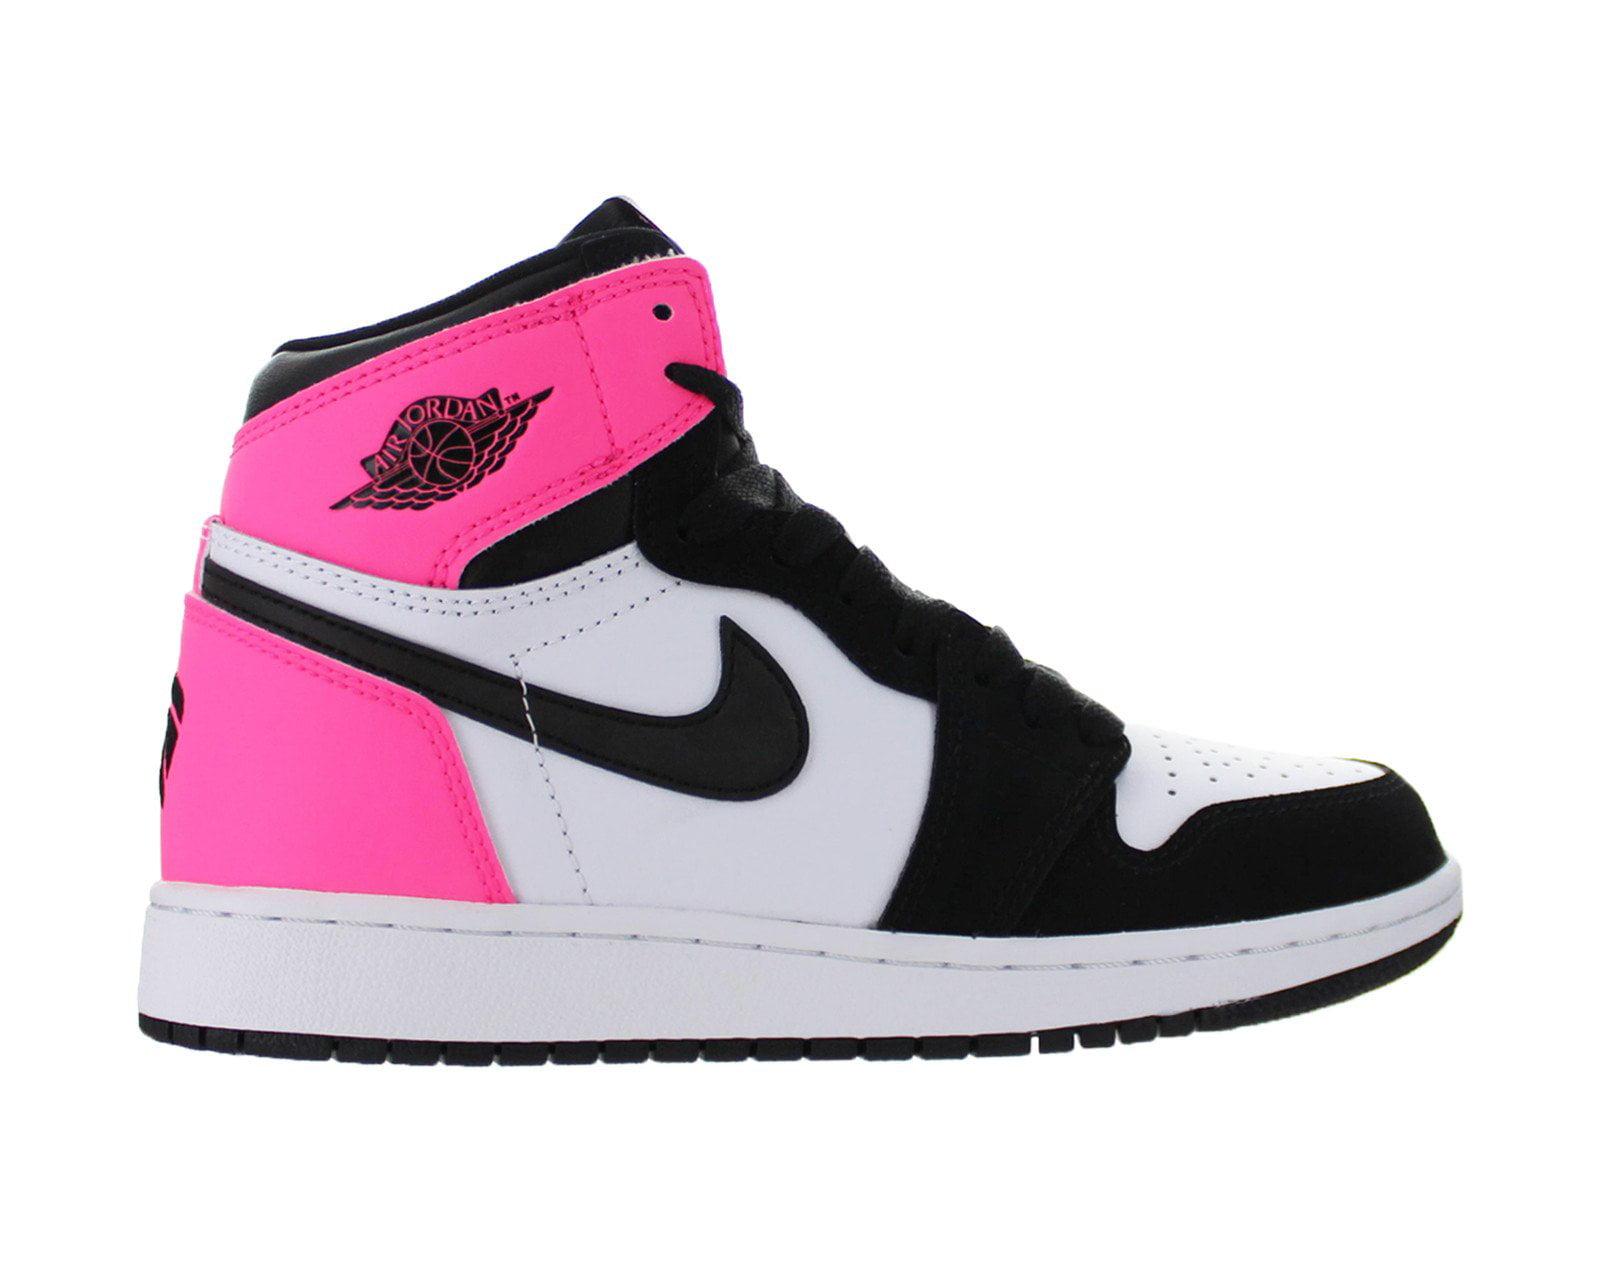 official photos e5248 a987f ... best price kids air jordan 1 retro high og gs valentines day hyper pink  black whi